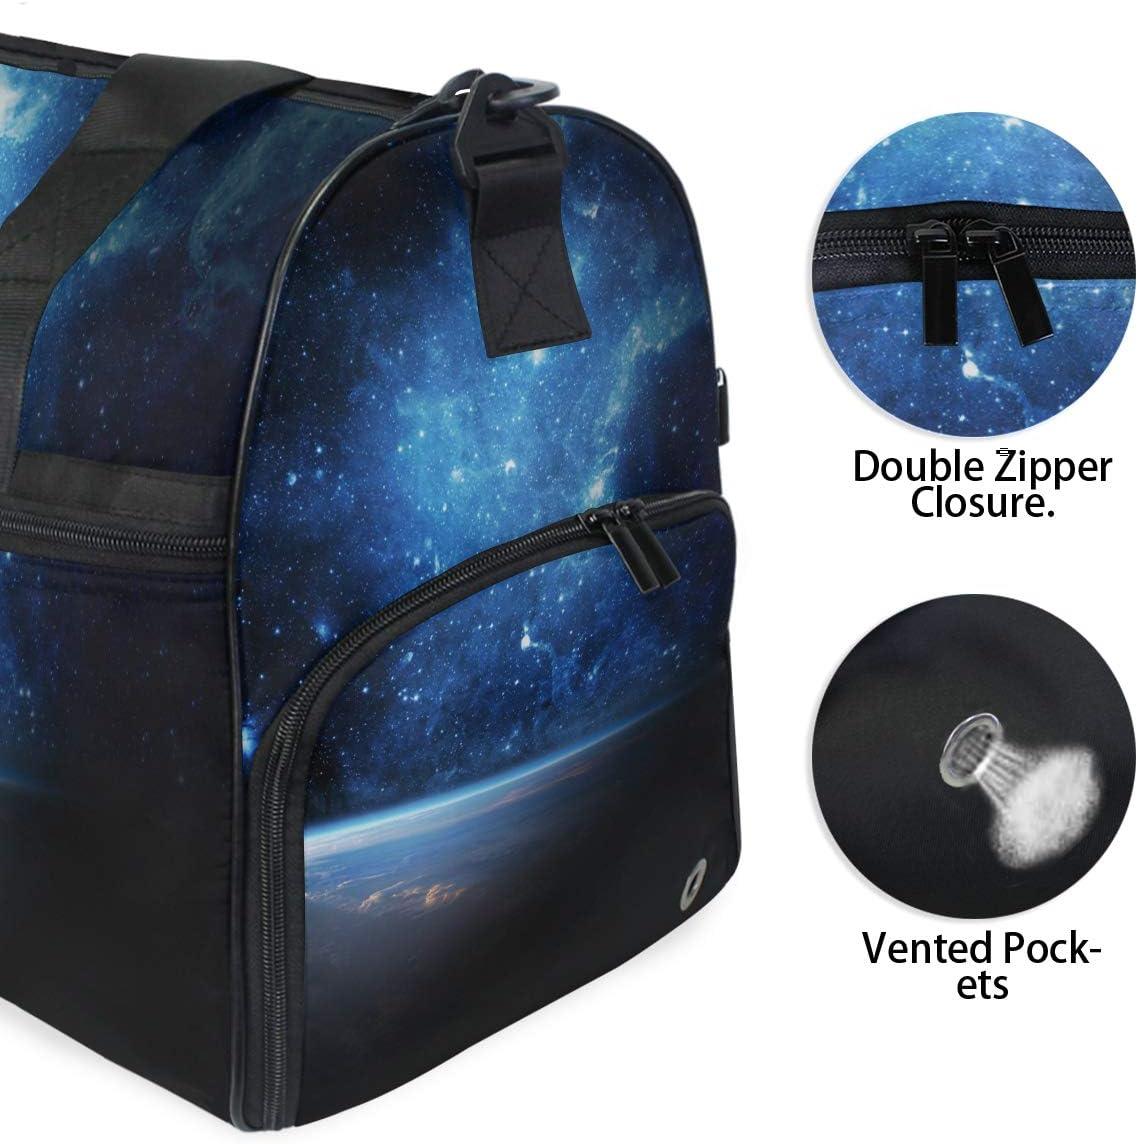 FAJRO Duffle Bag for Women Men Star Sky Travel Duffel Bag Large Size Water-proof Tear Resistant